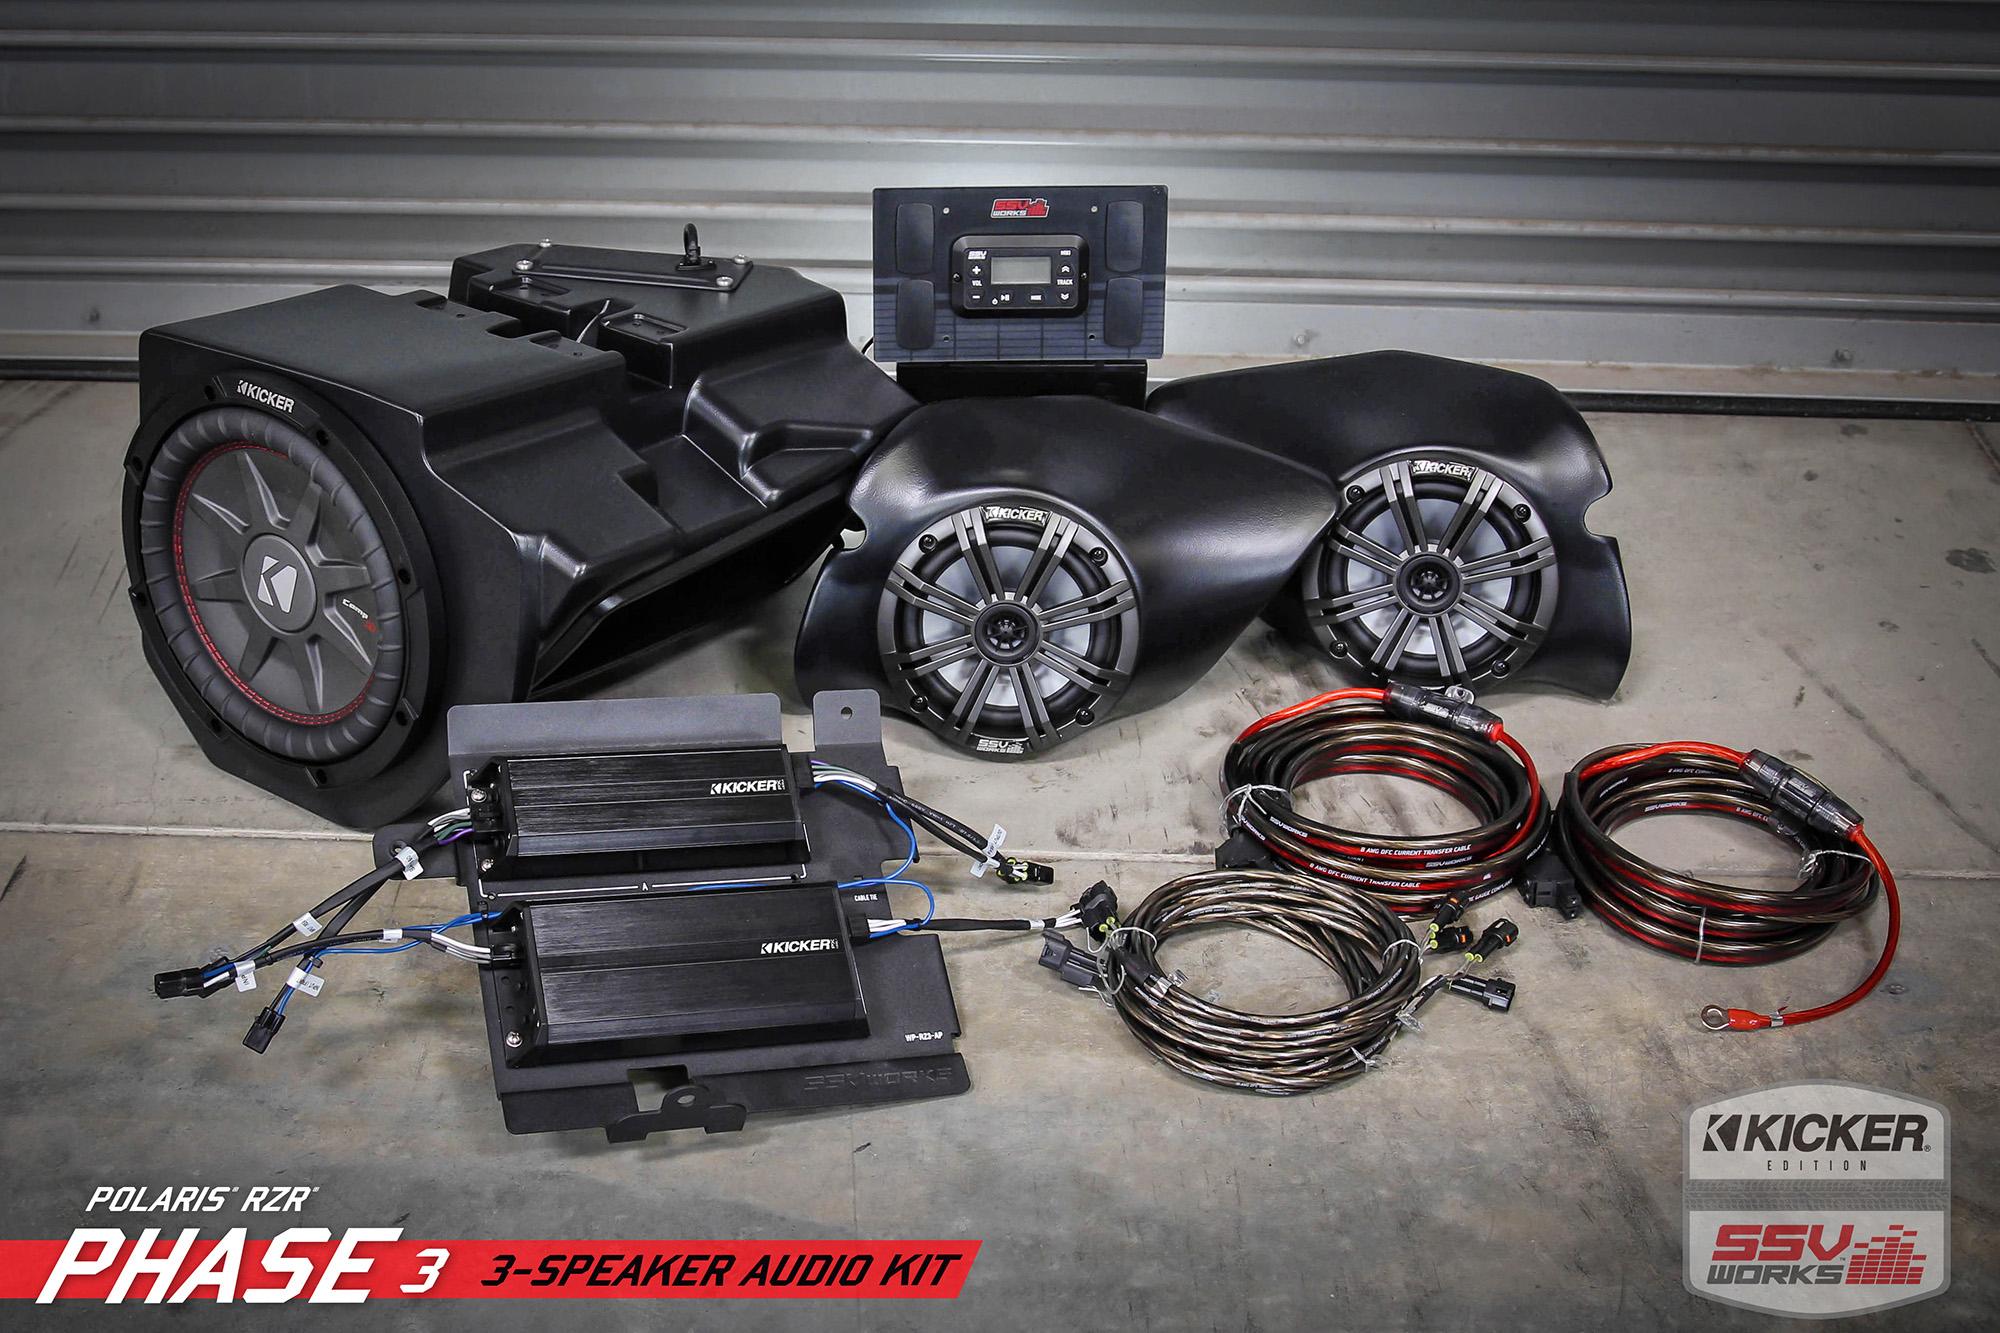 Ssv Works Polaris Rzr Xp1000 Turbo Plug And Play Complete